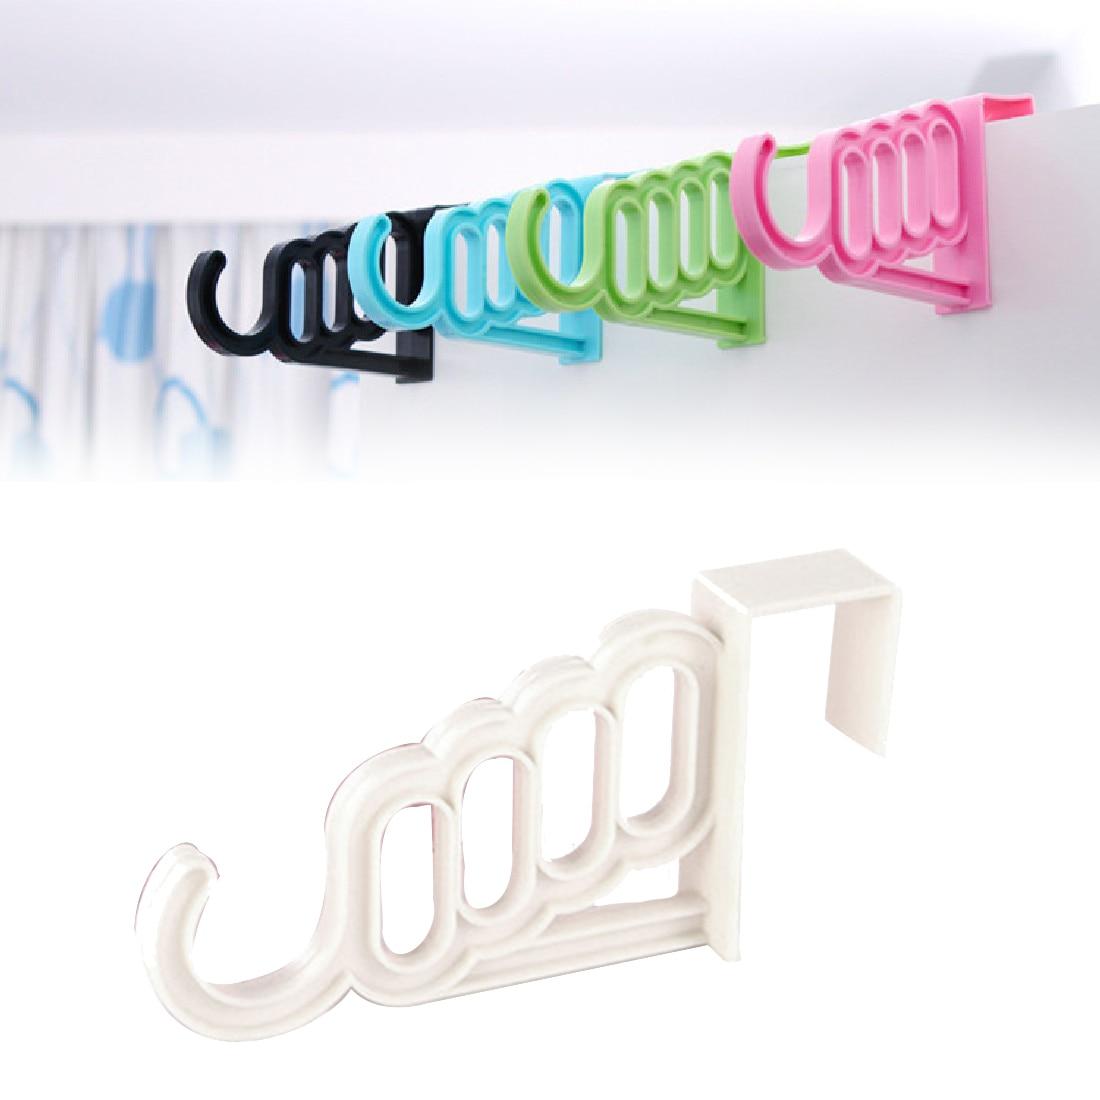 Top Sale ABS Plastic Candy Color Multifunctional Durable Bathroom Kitchen Door Hanger Hook For Clothes Towel Bag